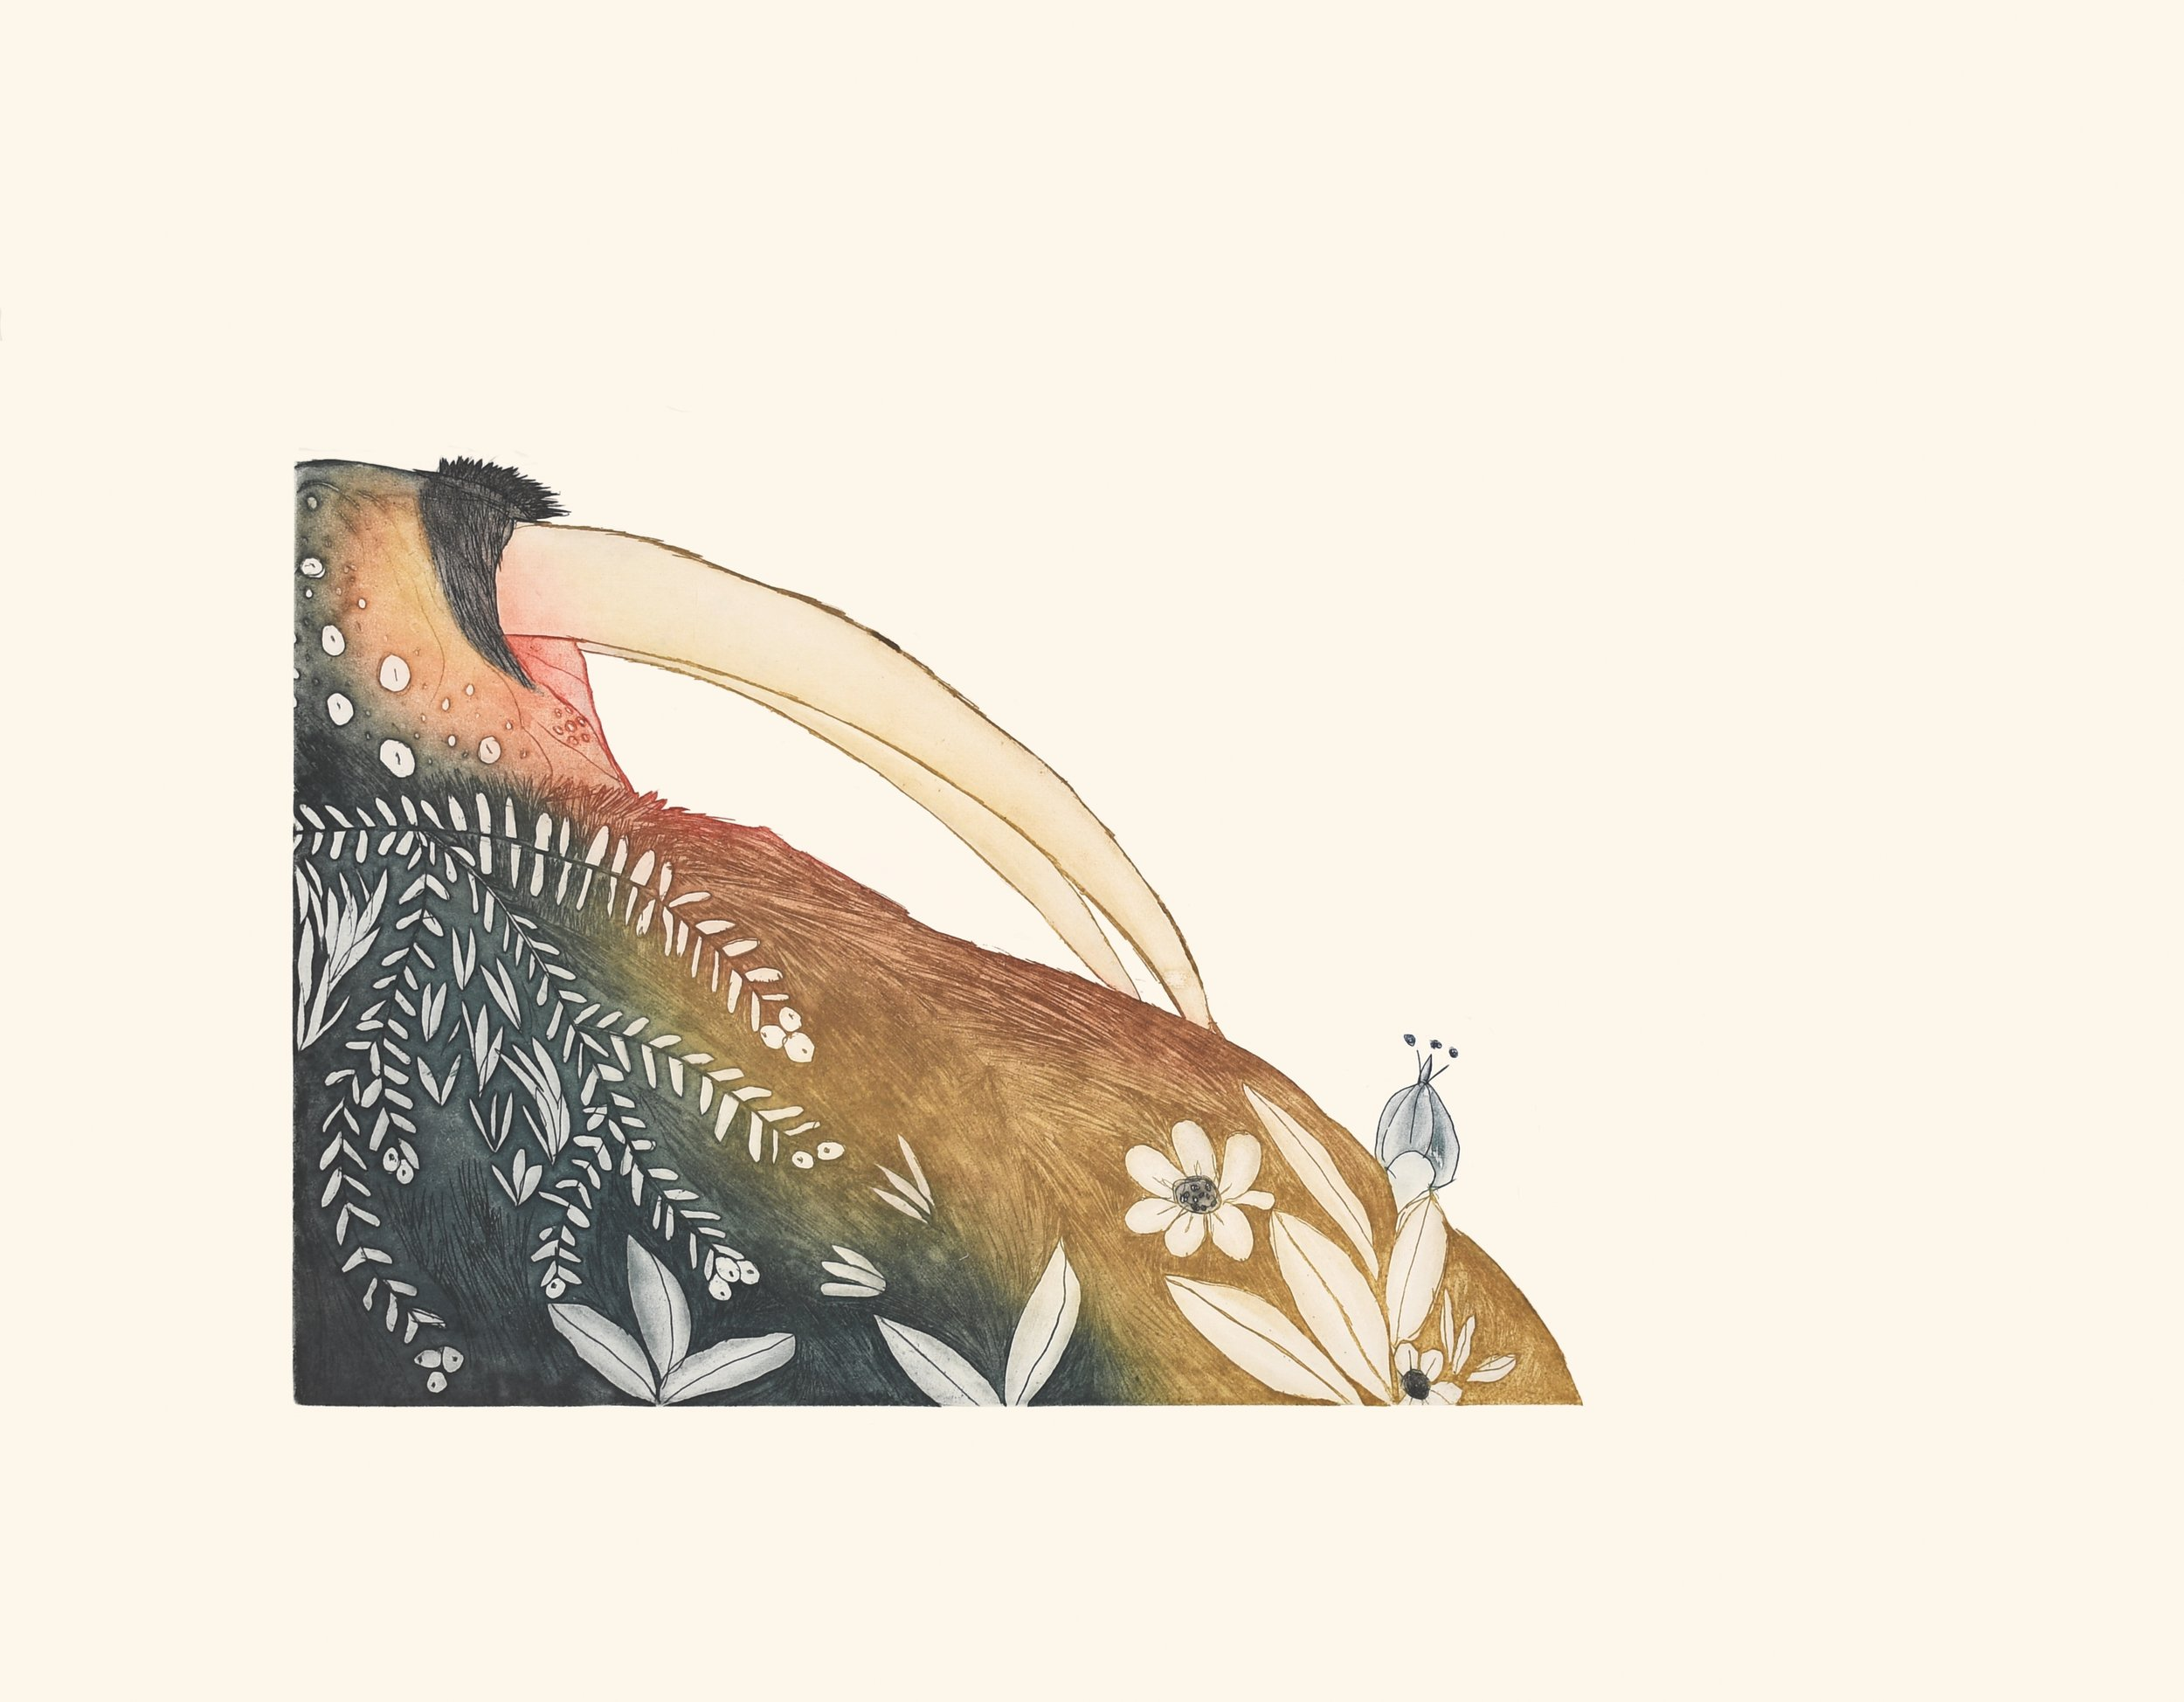 NINGIUKULU TEEVEE  6. Basking Walrus  Etching & Aquatint  Paper: Arches White  Printer: Studio PM  57.5 x 72 cm  $ 800